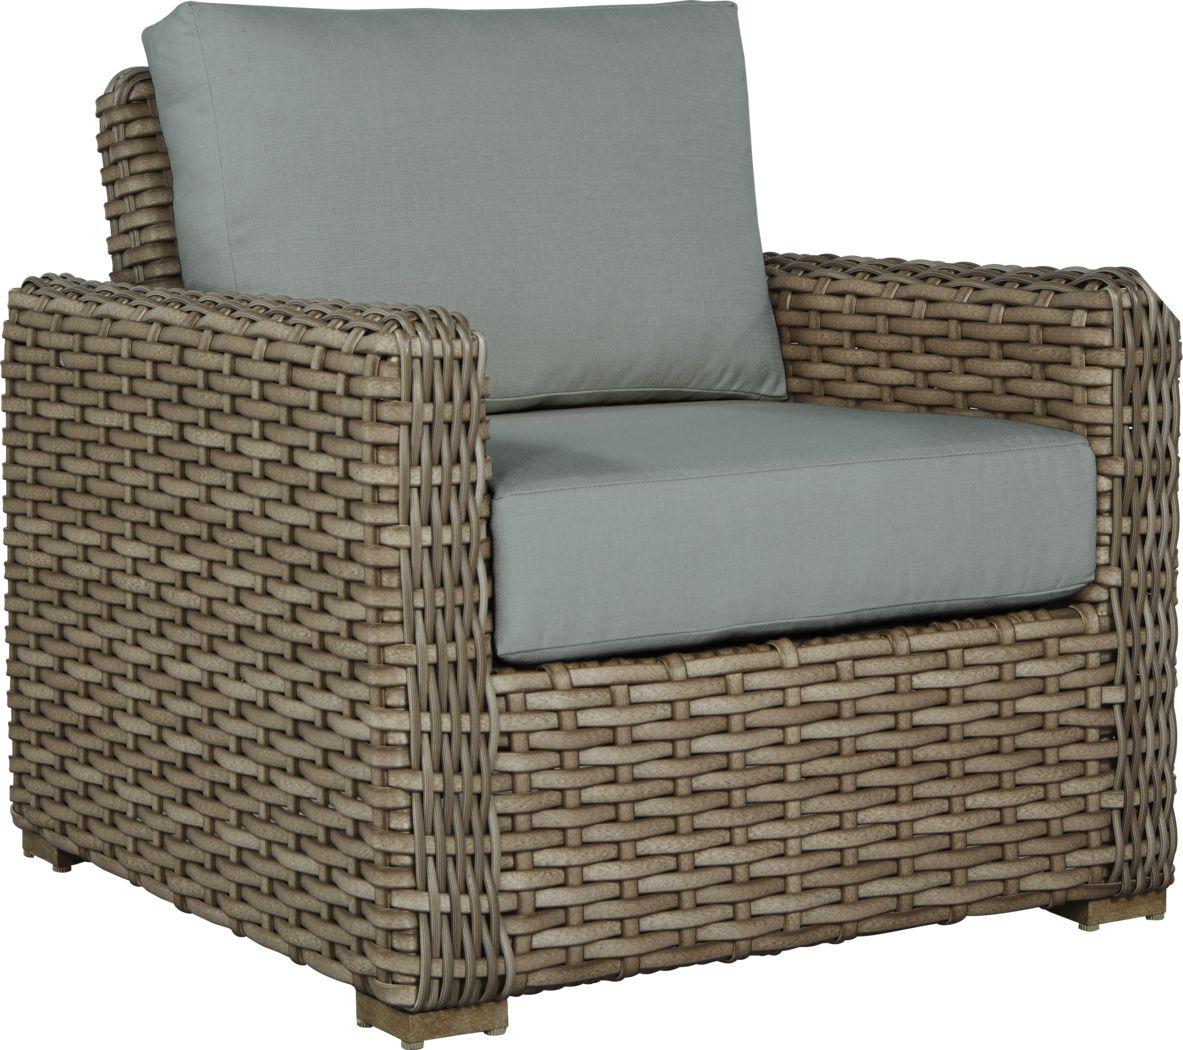 Siesta Key Driftwood Outdoor Chair with Mist Cushions